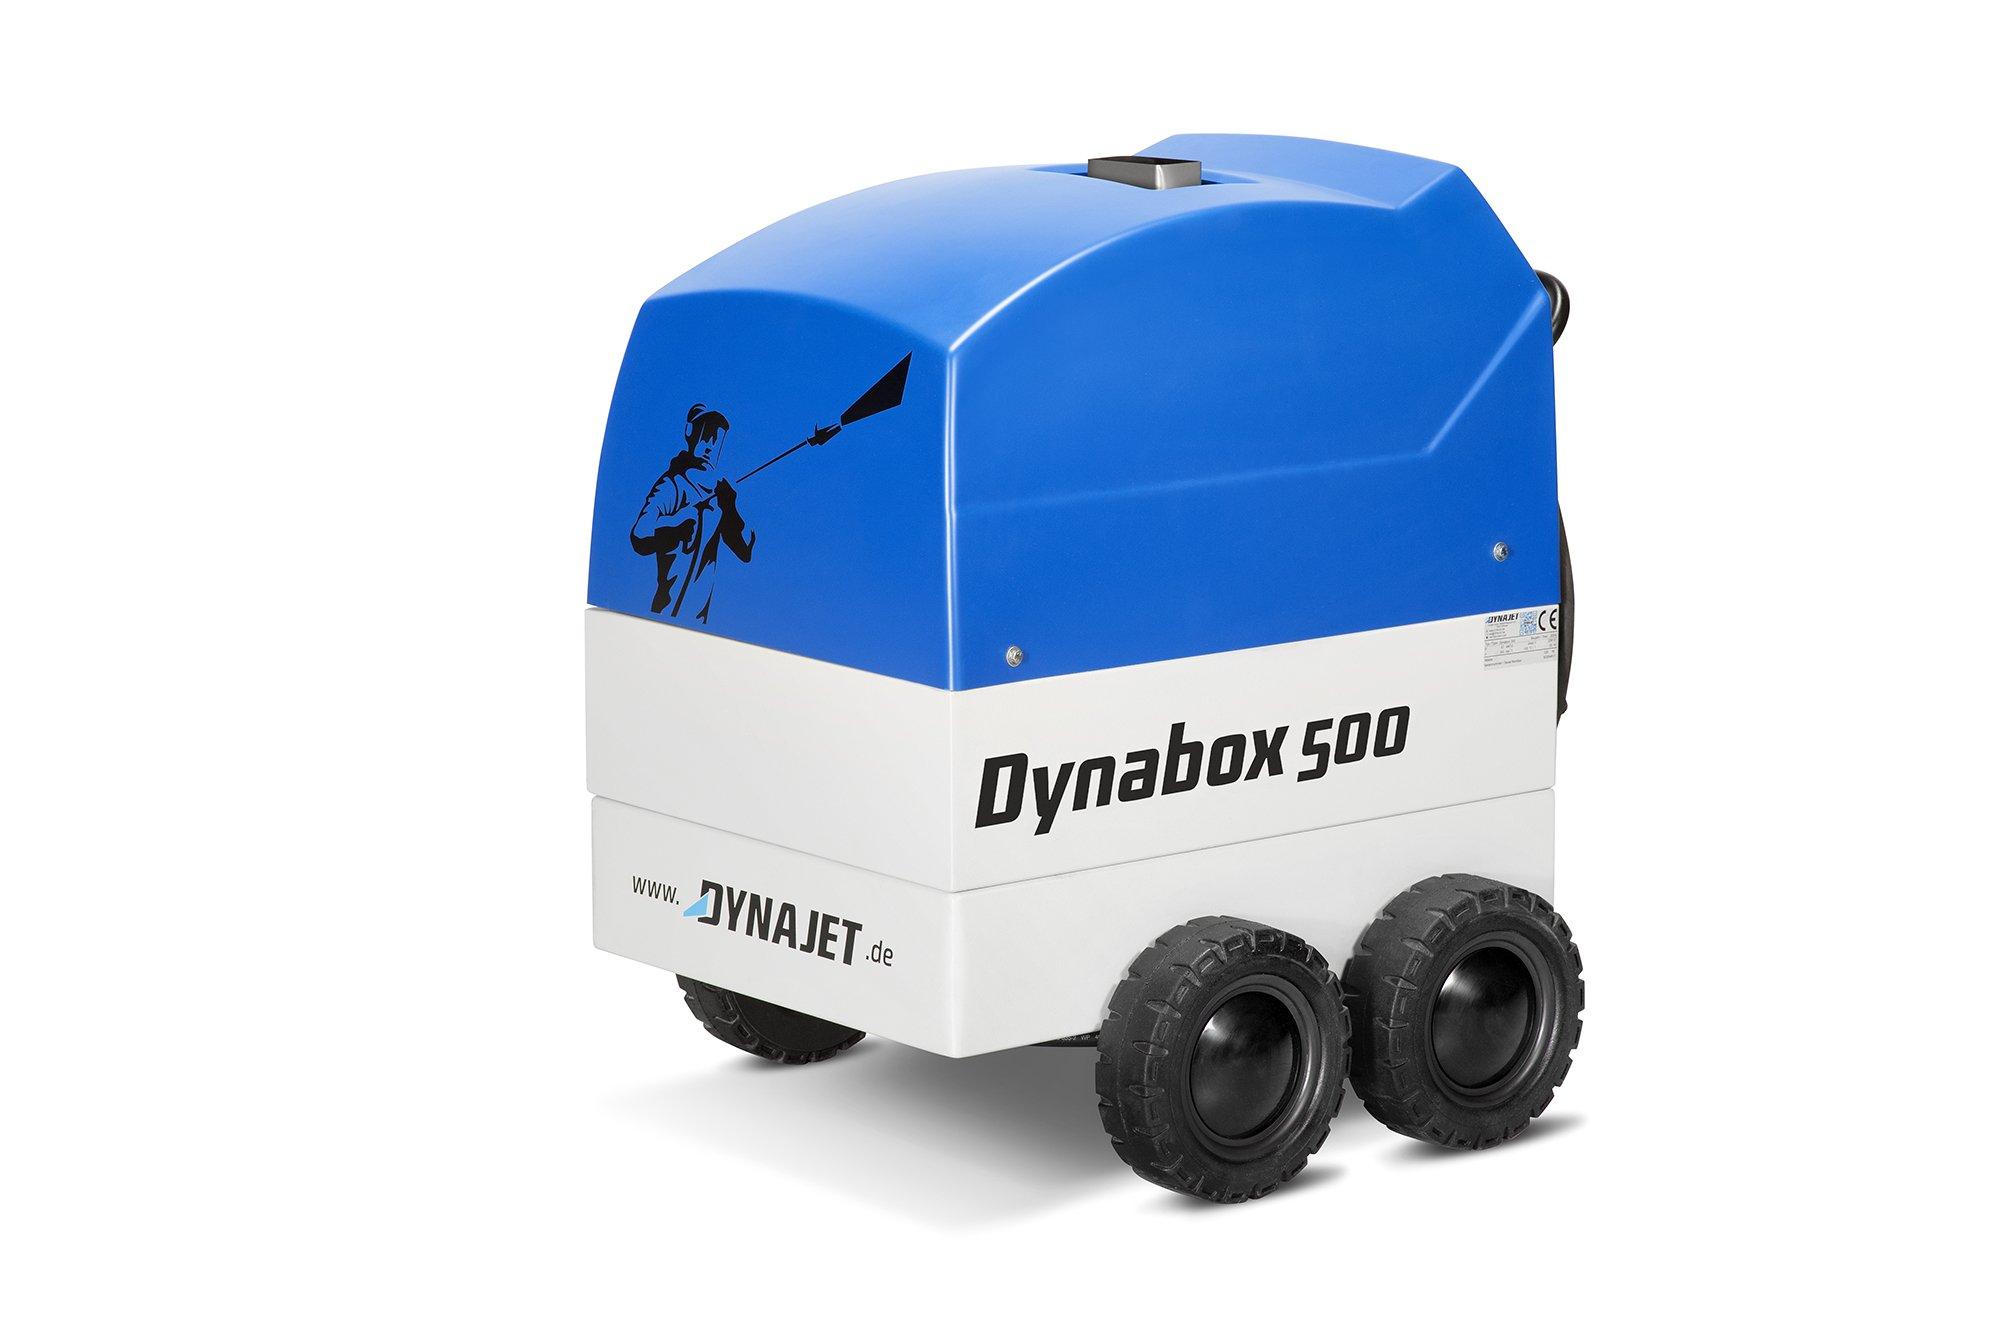 68-1521009 Dynabox hotbox hetvattenpanna